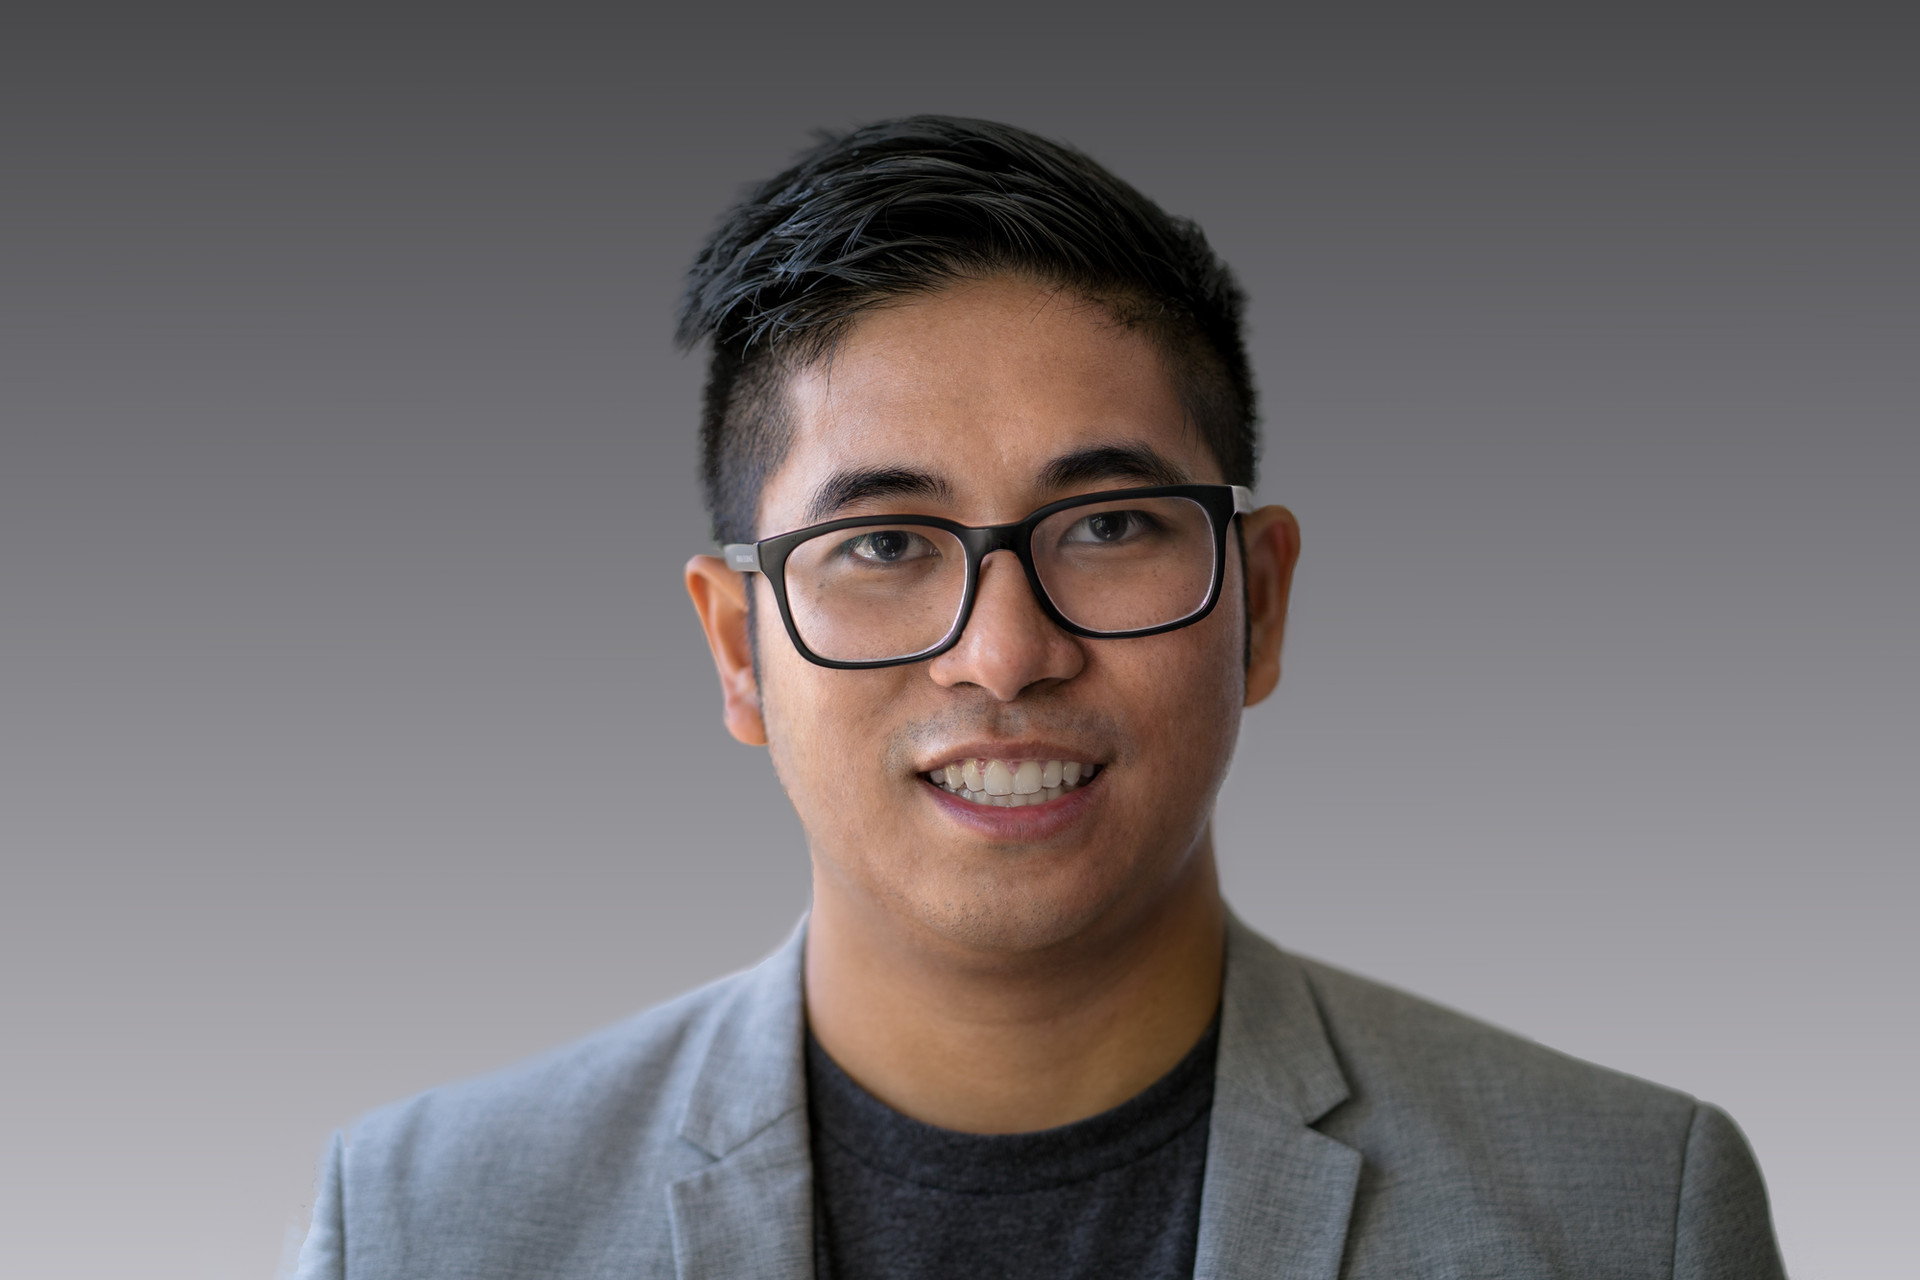 Calgary headshot, Real Estate Investor. Blake Petilos